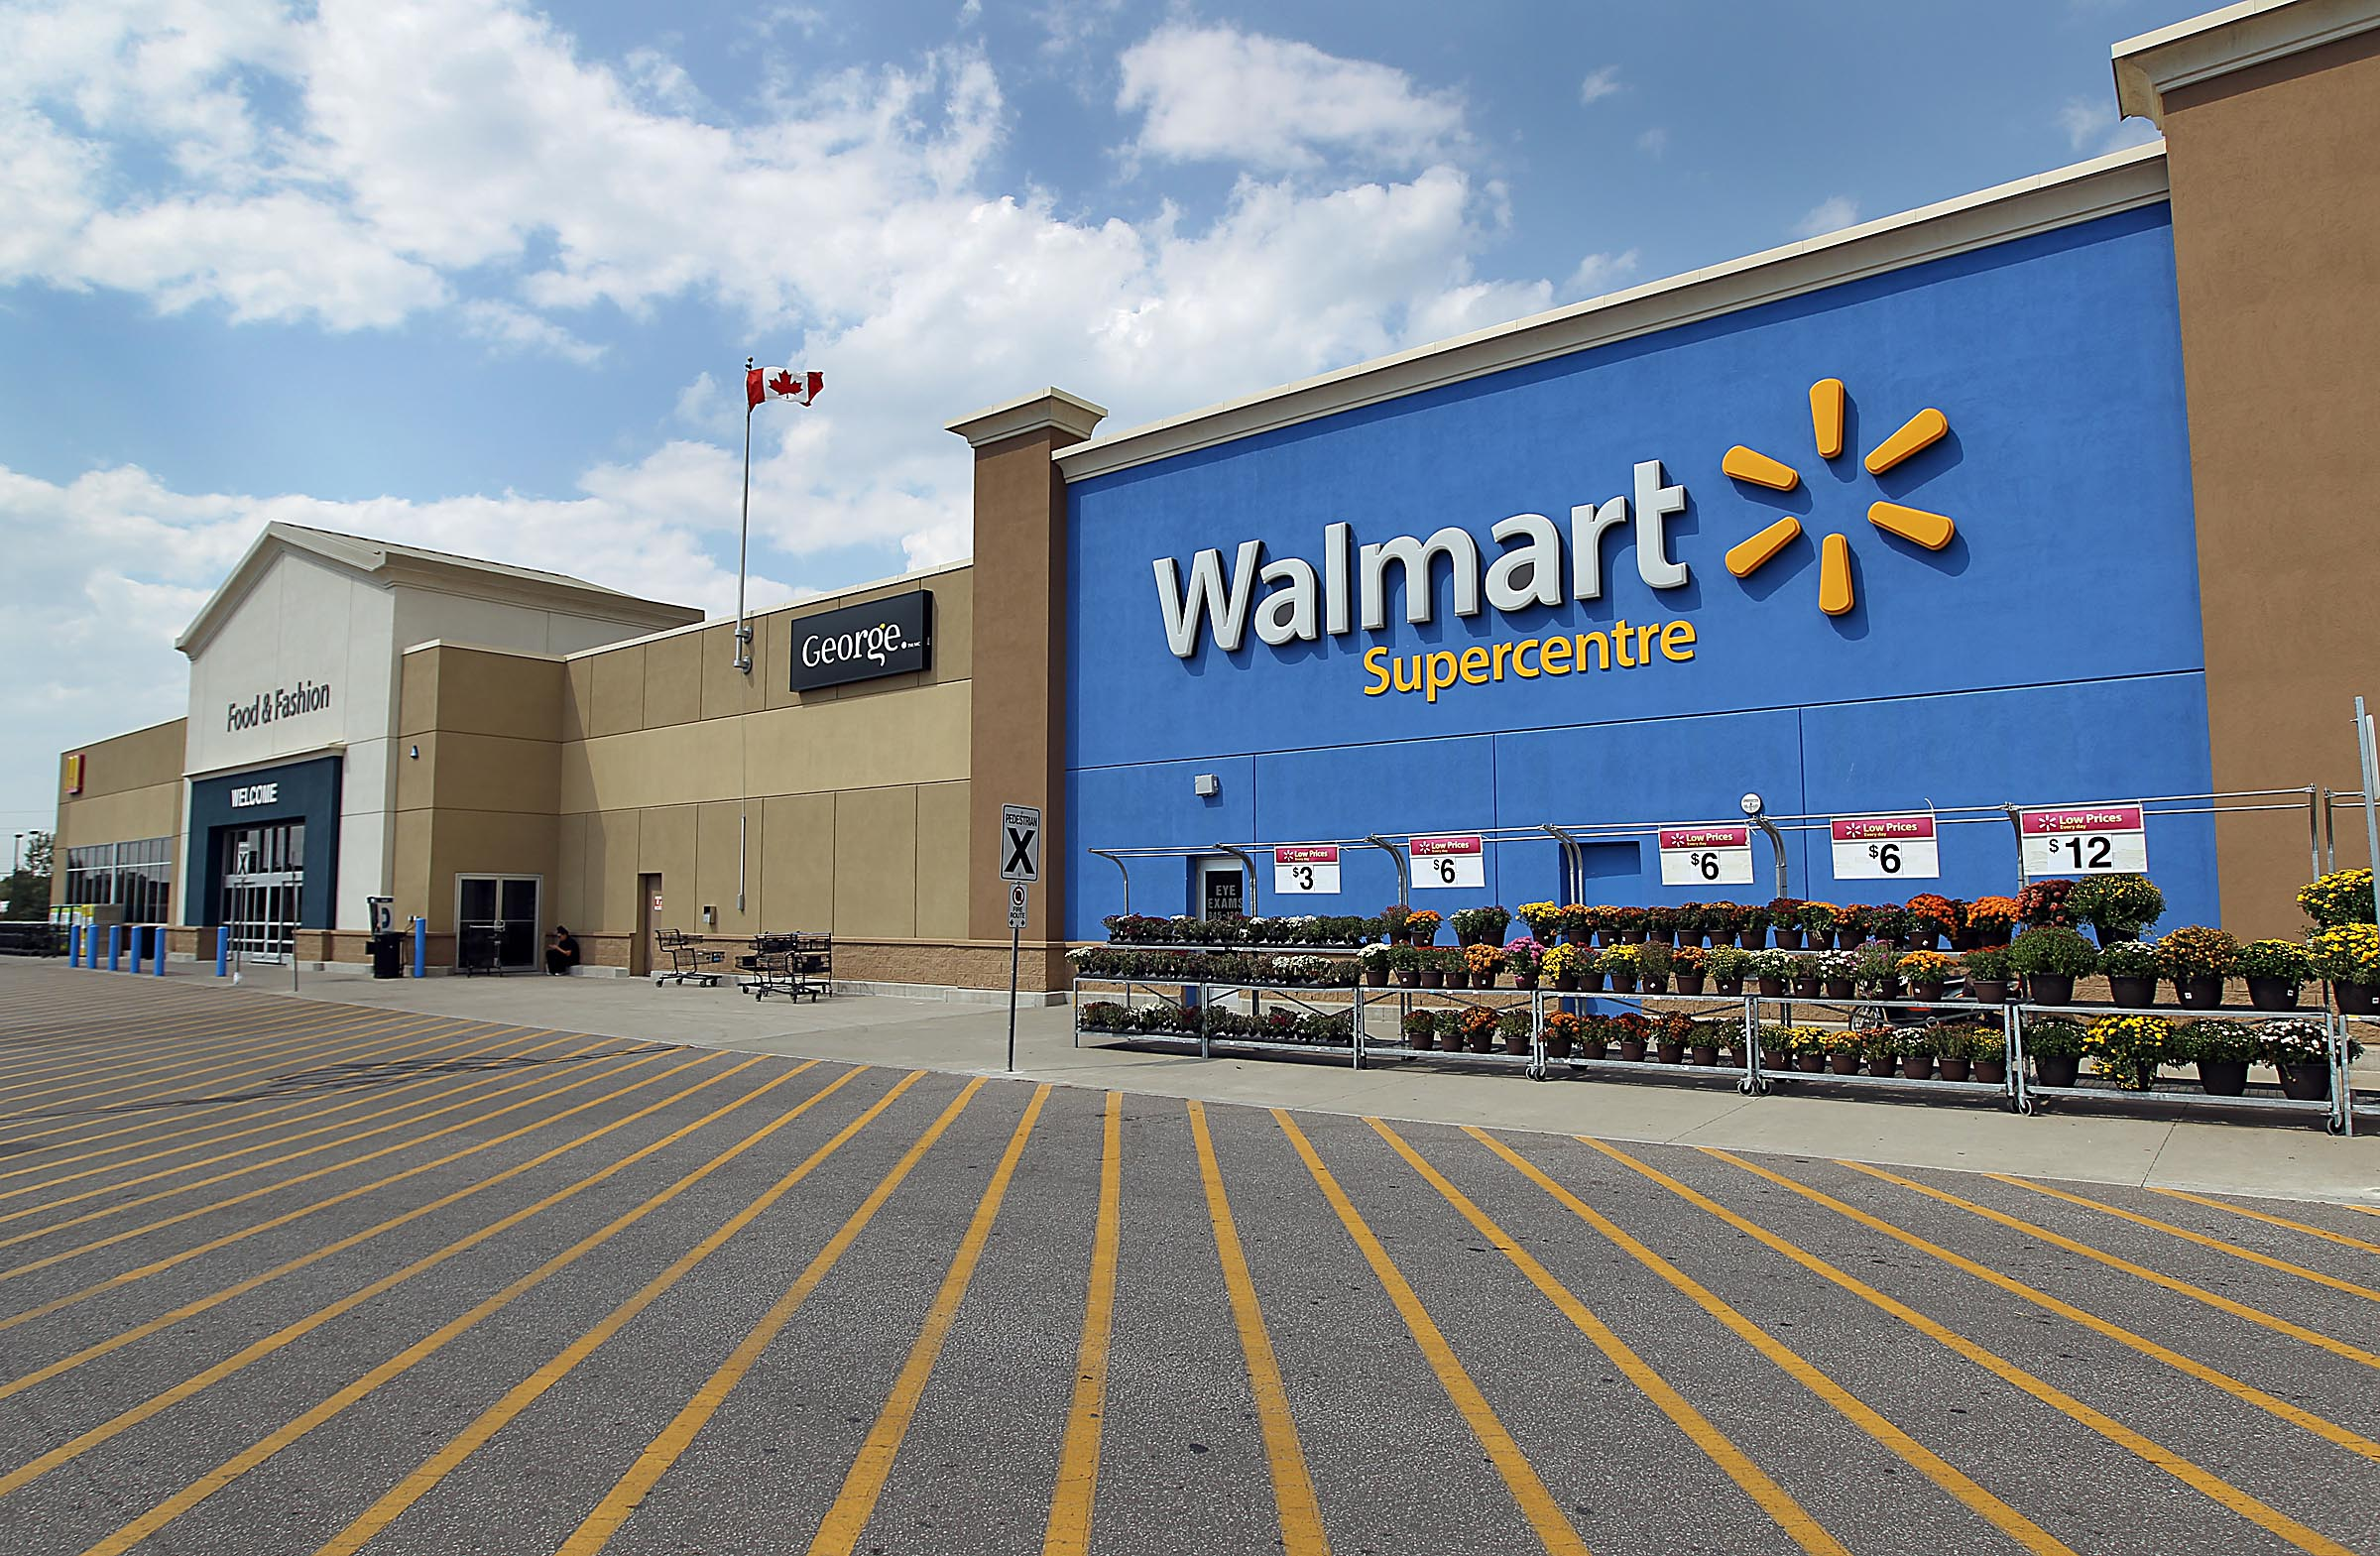 Wal-Mart in New Liskeard, Ontario*